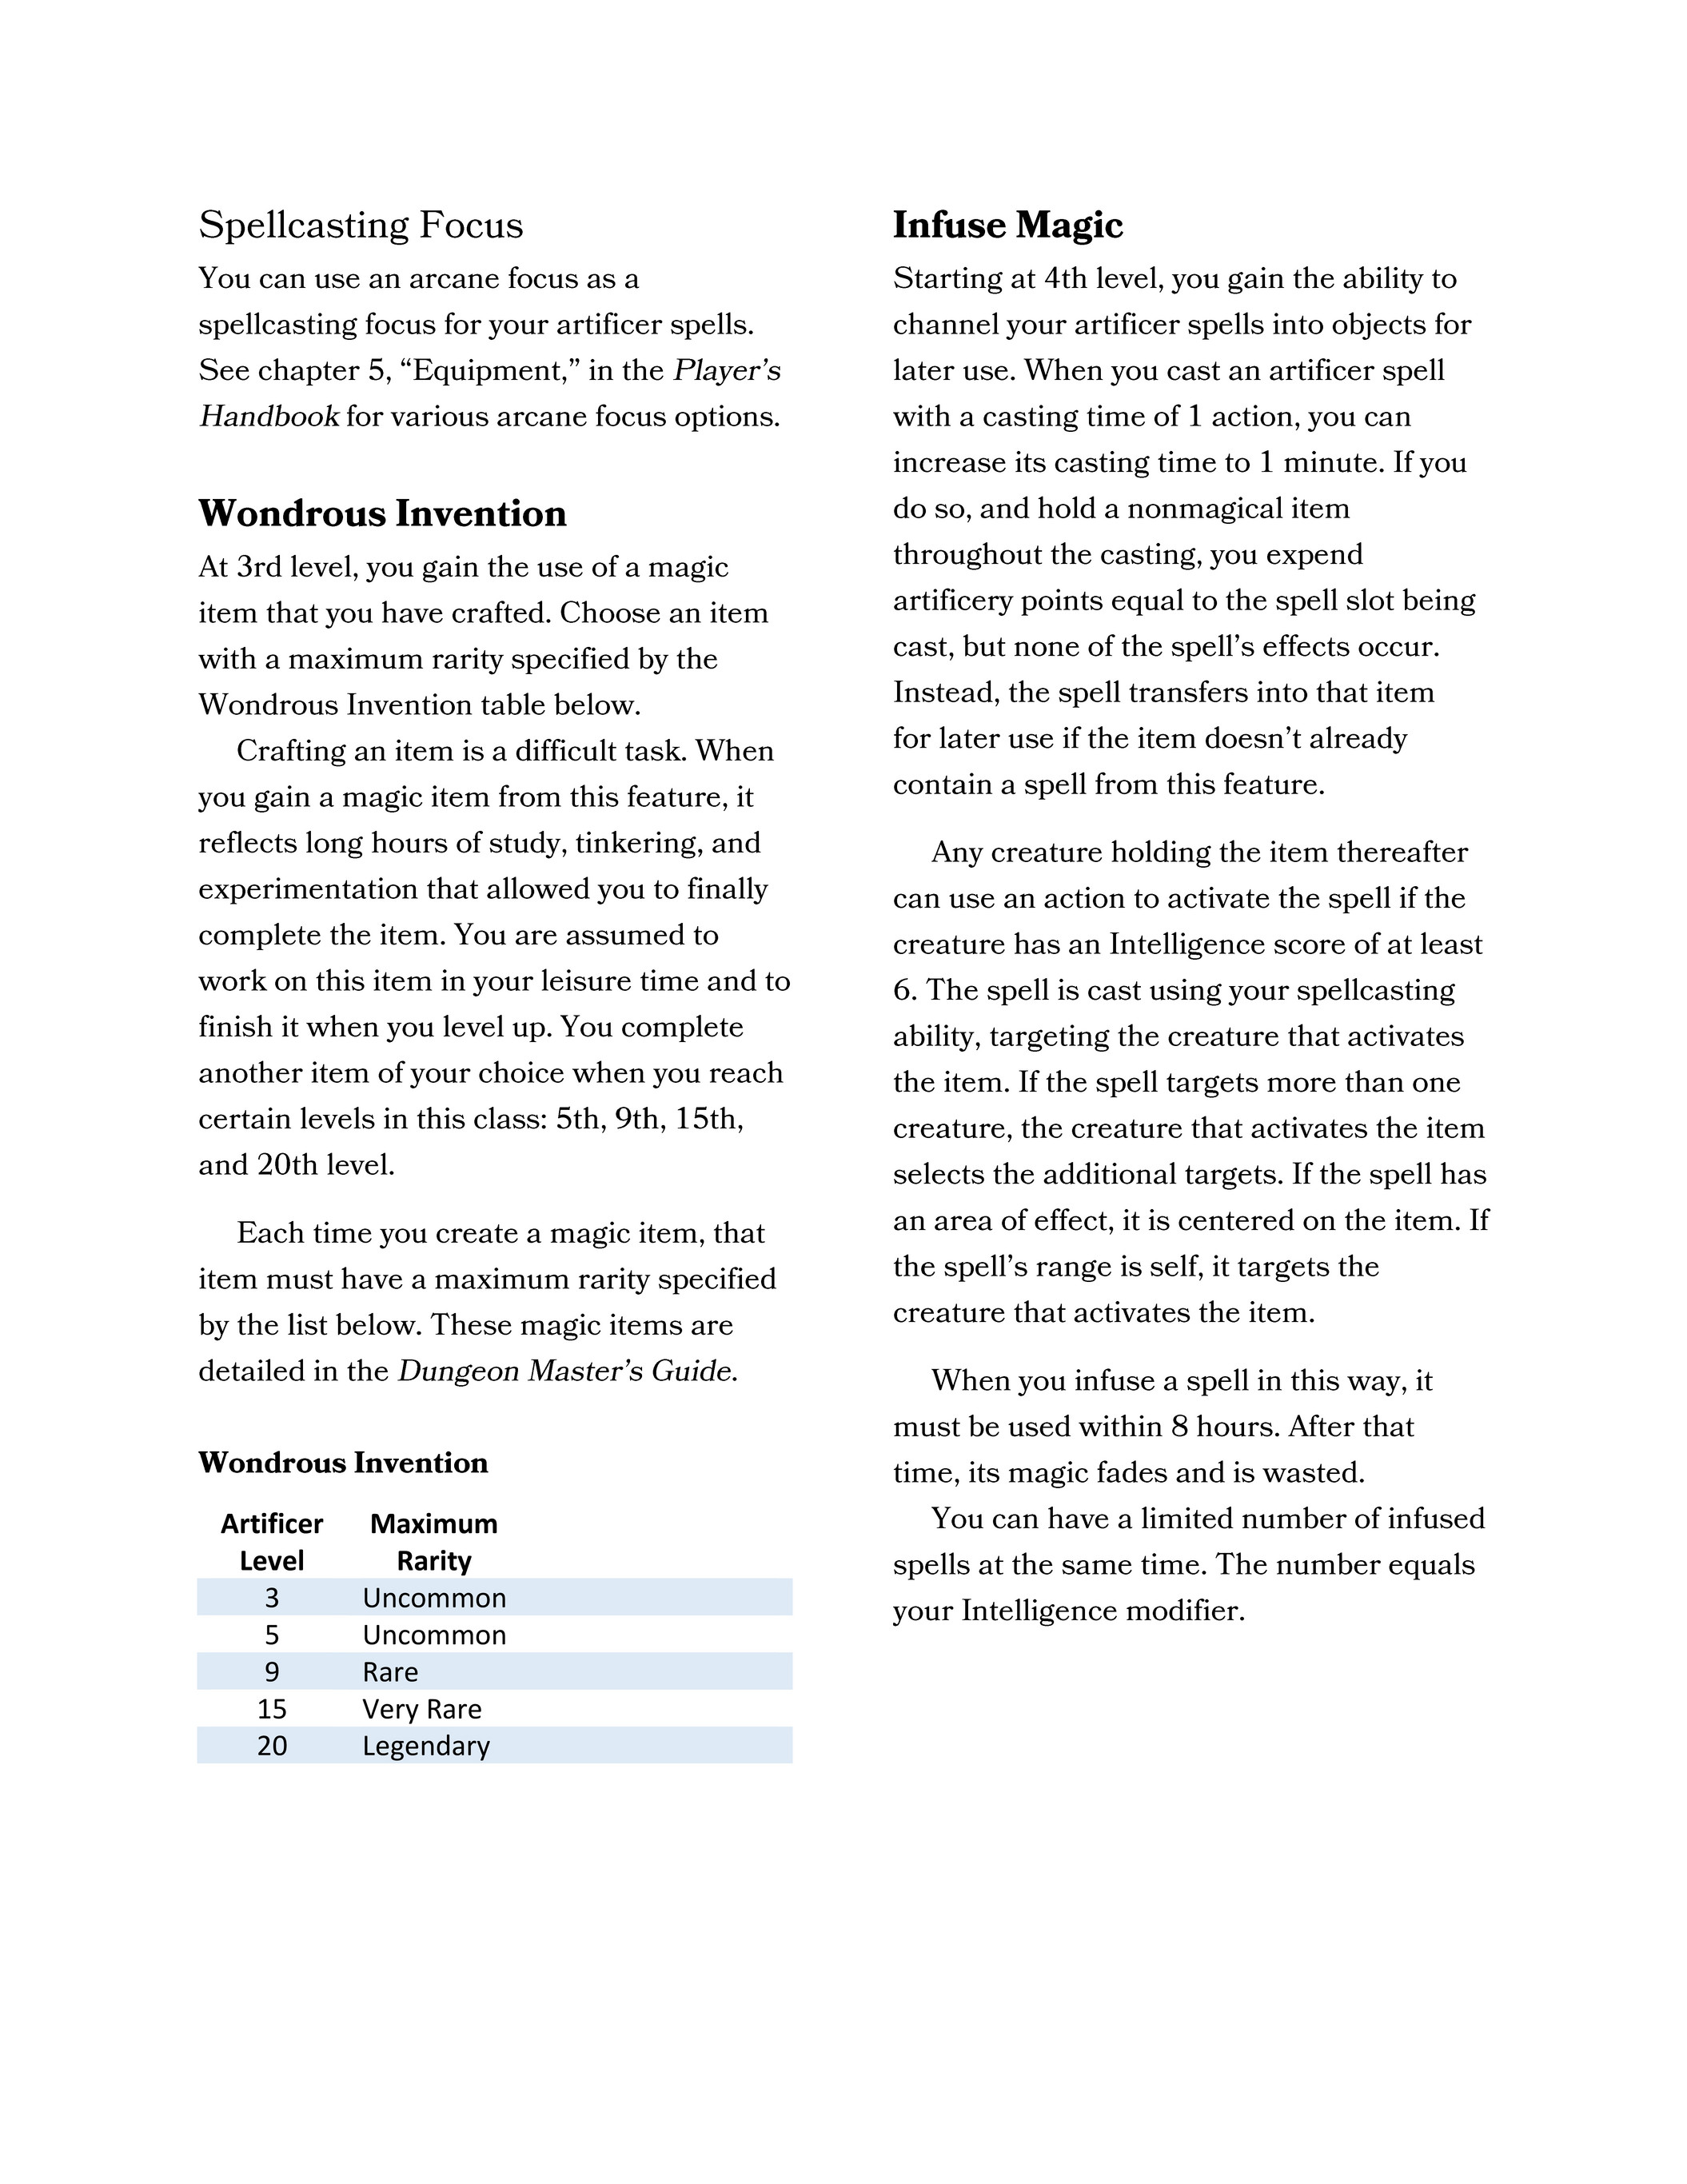 1988 Ua Artificer Homebrew Update Frognosticator V2 0 Page 1 Created With Publitas Com 2020 spells and magic tattoos. publitas